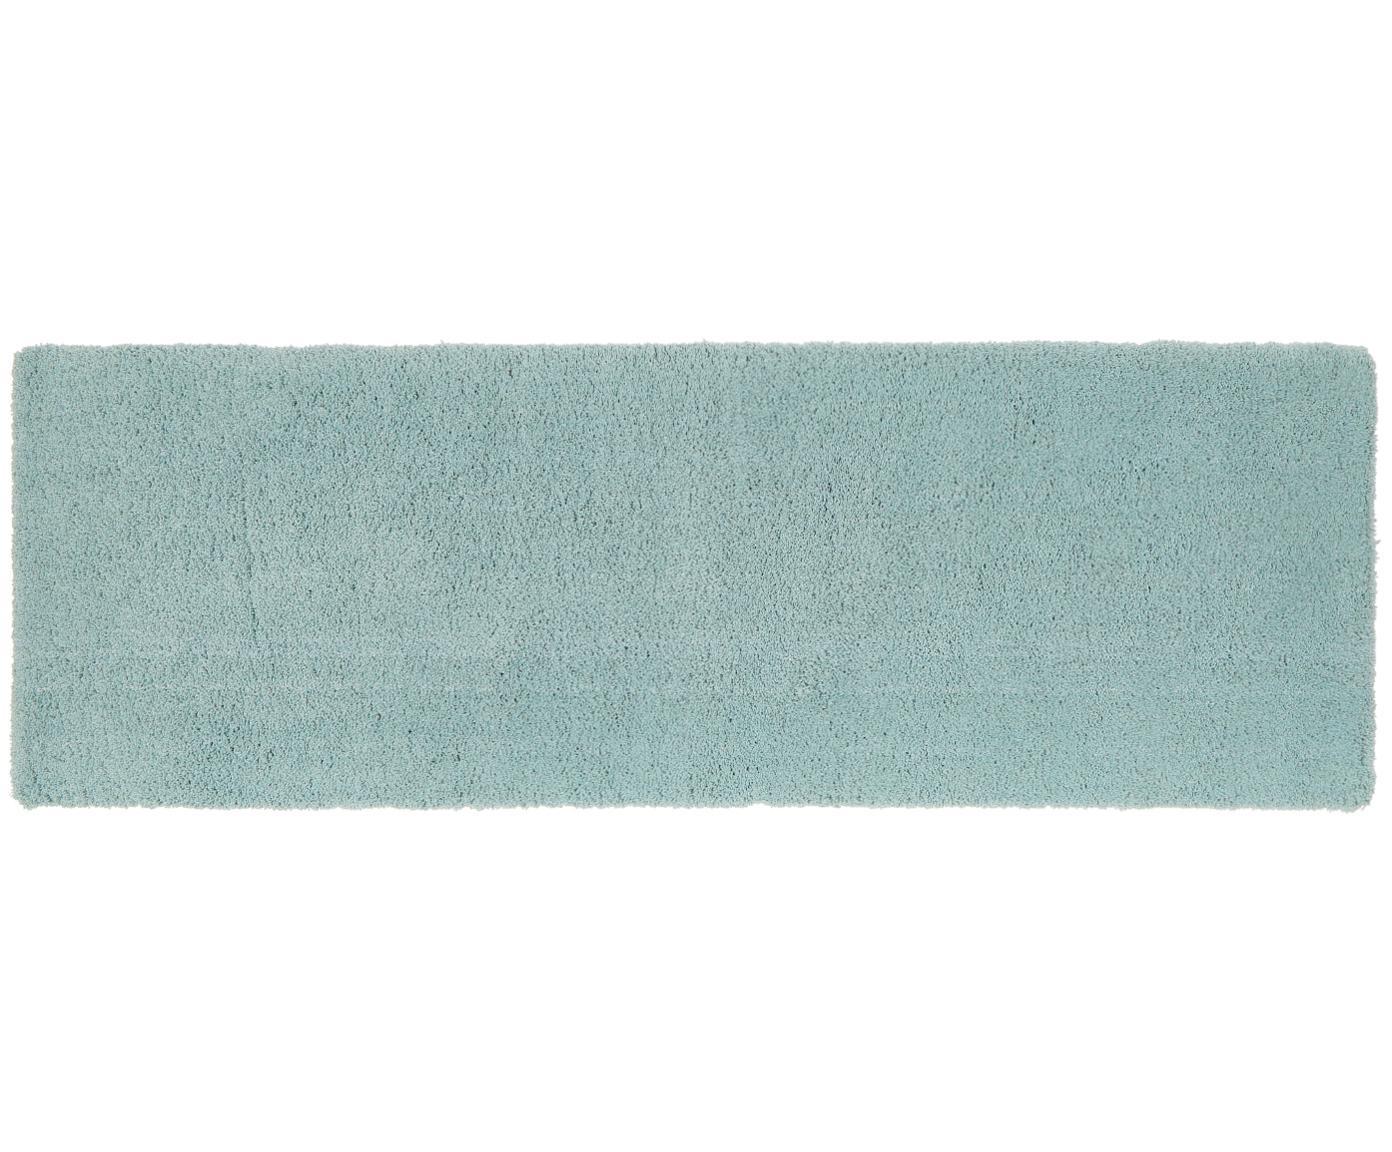 Passatoia pelosa morbida verde menta Leighton, Retro: 100% poliestere, Verde menta, Larg. 80 x Lung. 250 cm